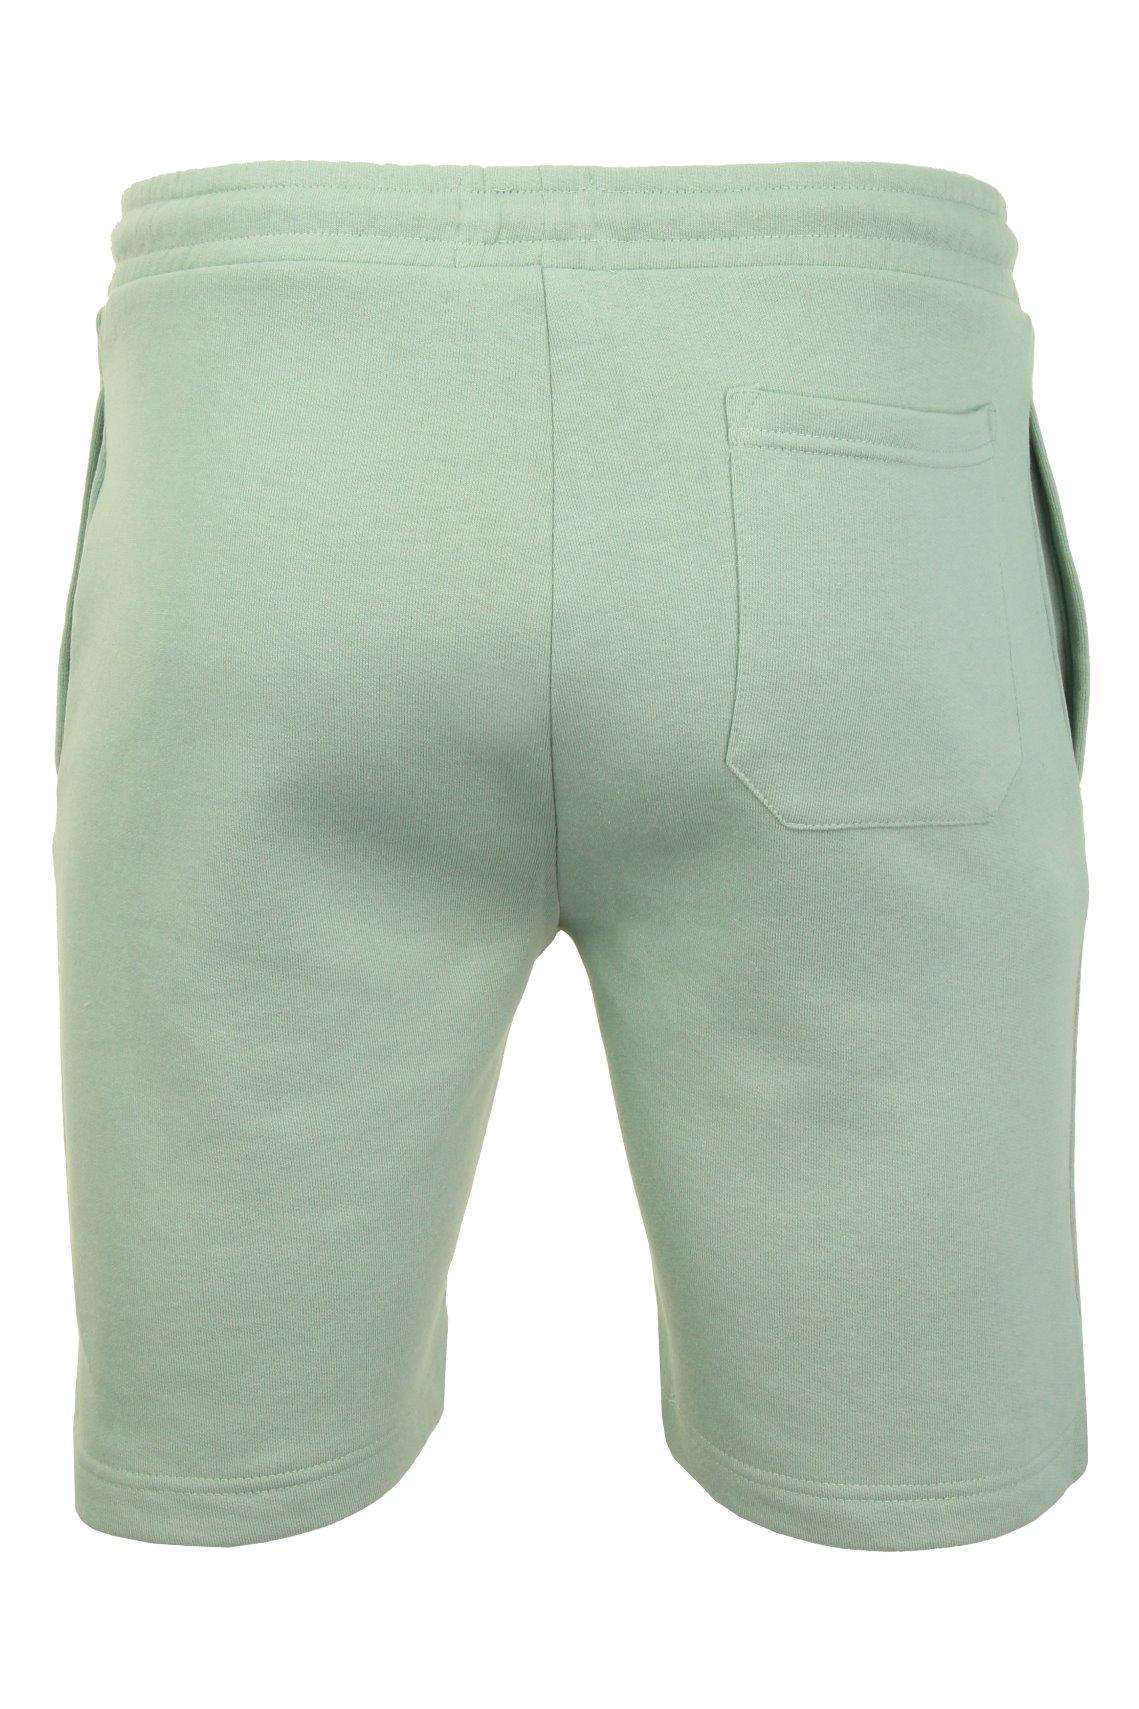 Mens-Jogger-Shorts-Tarley-by-Brave-Soul-Knee-Length-Casual-Fleece-Lined-Summer thumbnail 15